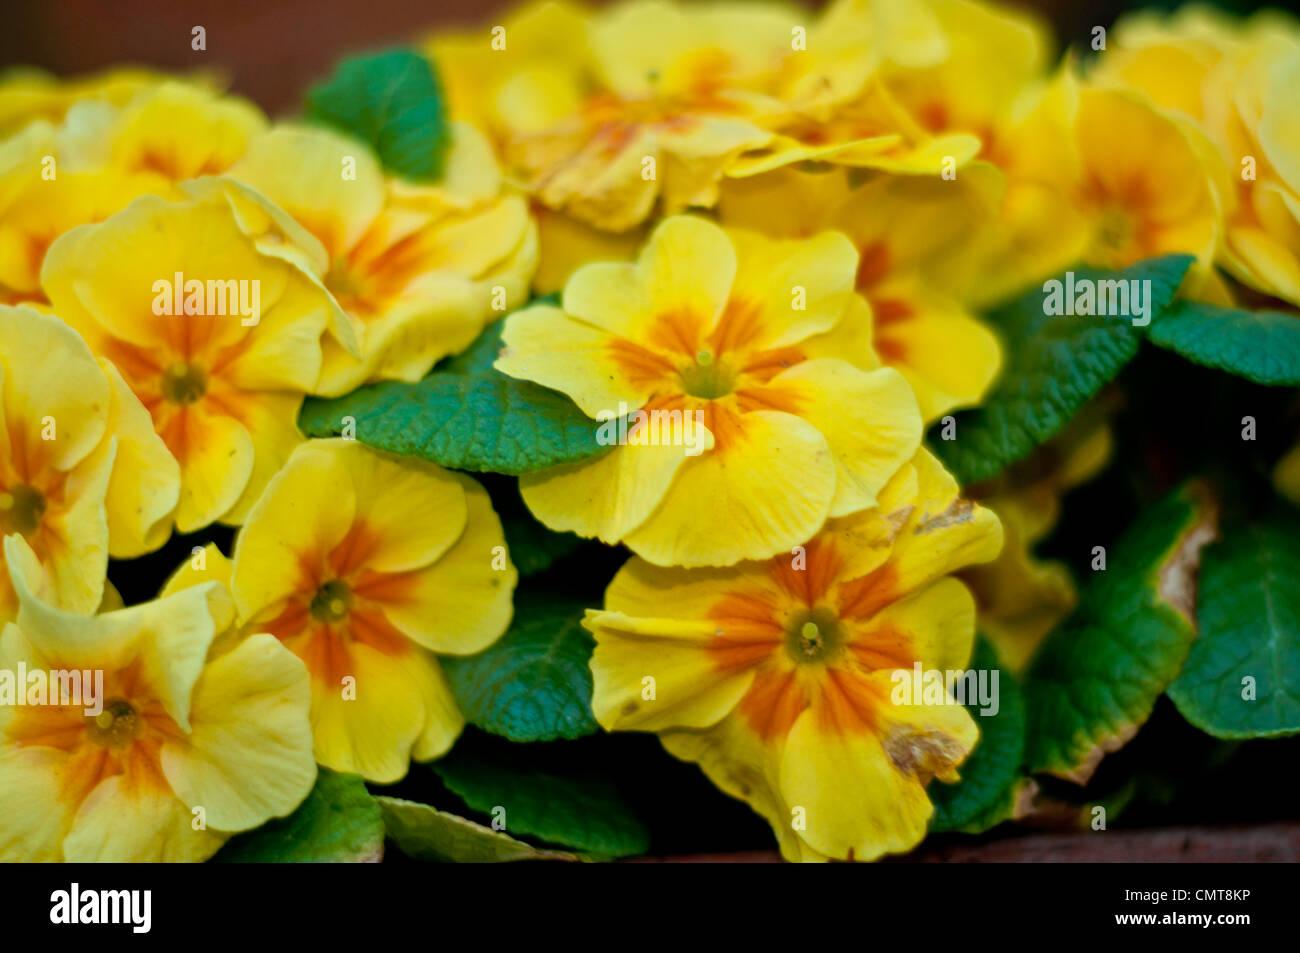 Bright Yellow Primrose Flowers Stock Photo 47247530 Alamy